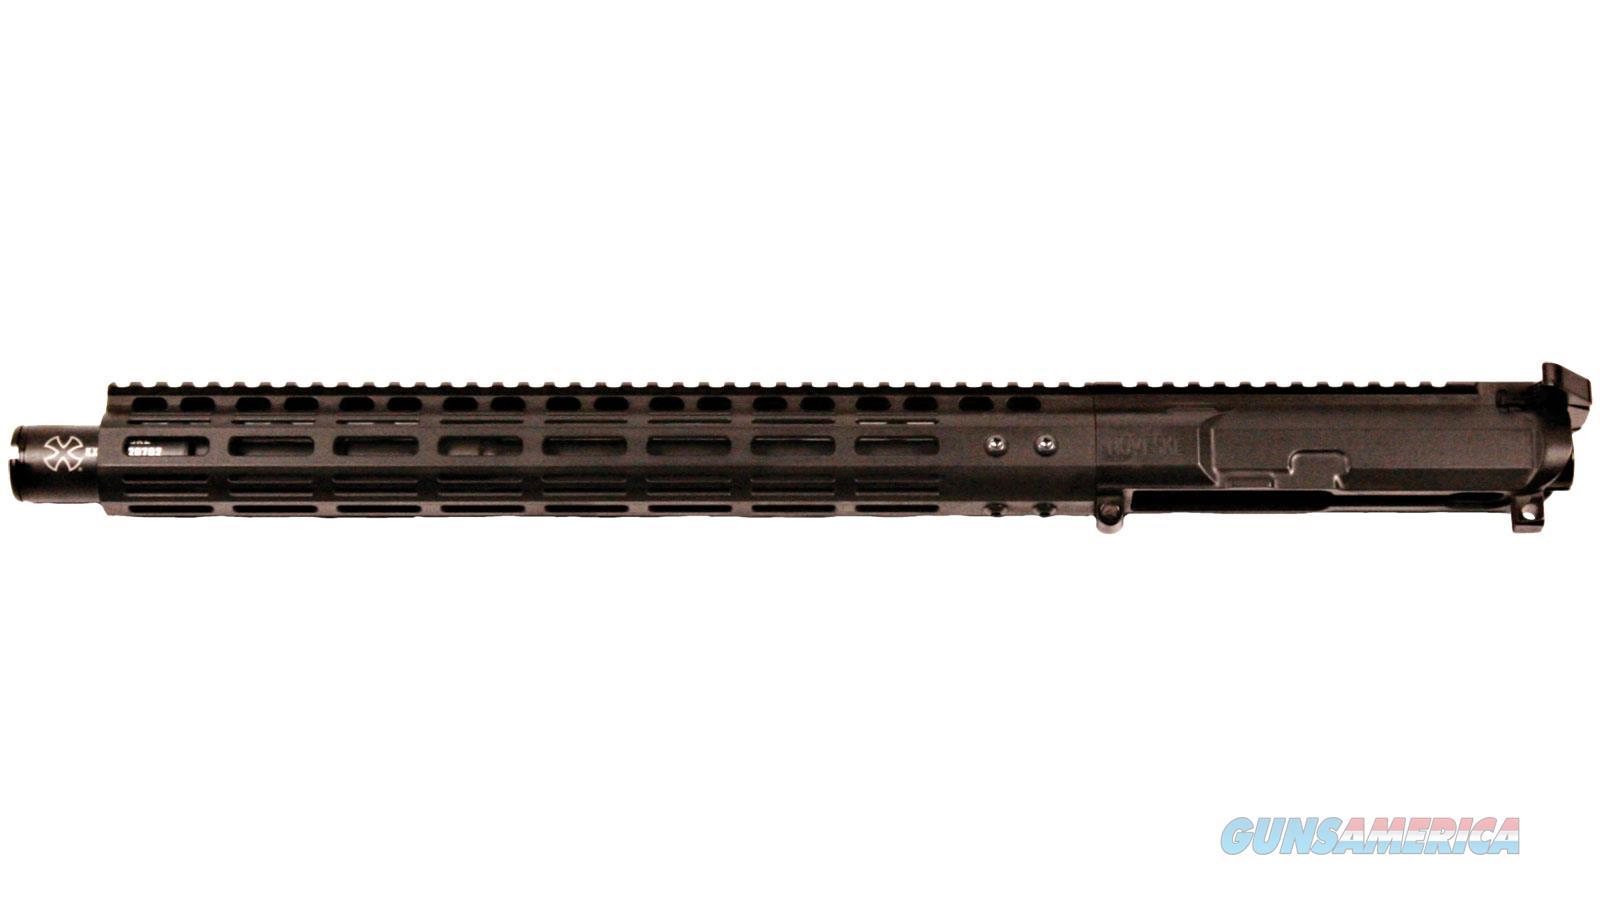 "Noveske Rifleworks Llc Geniii 13.7"" Infidel Mlok 03000331  Non-Guns > Gun Parts > M16-AR15 > Upper Only"